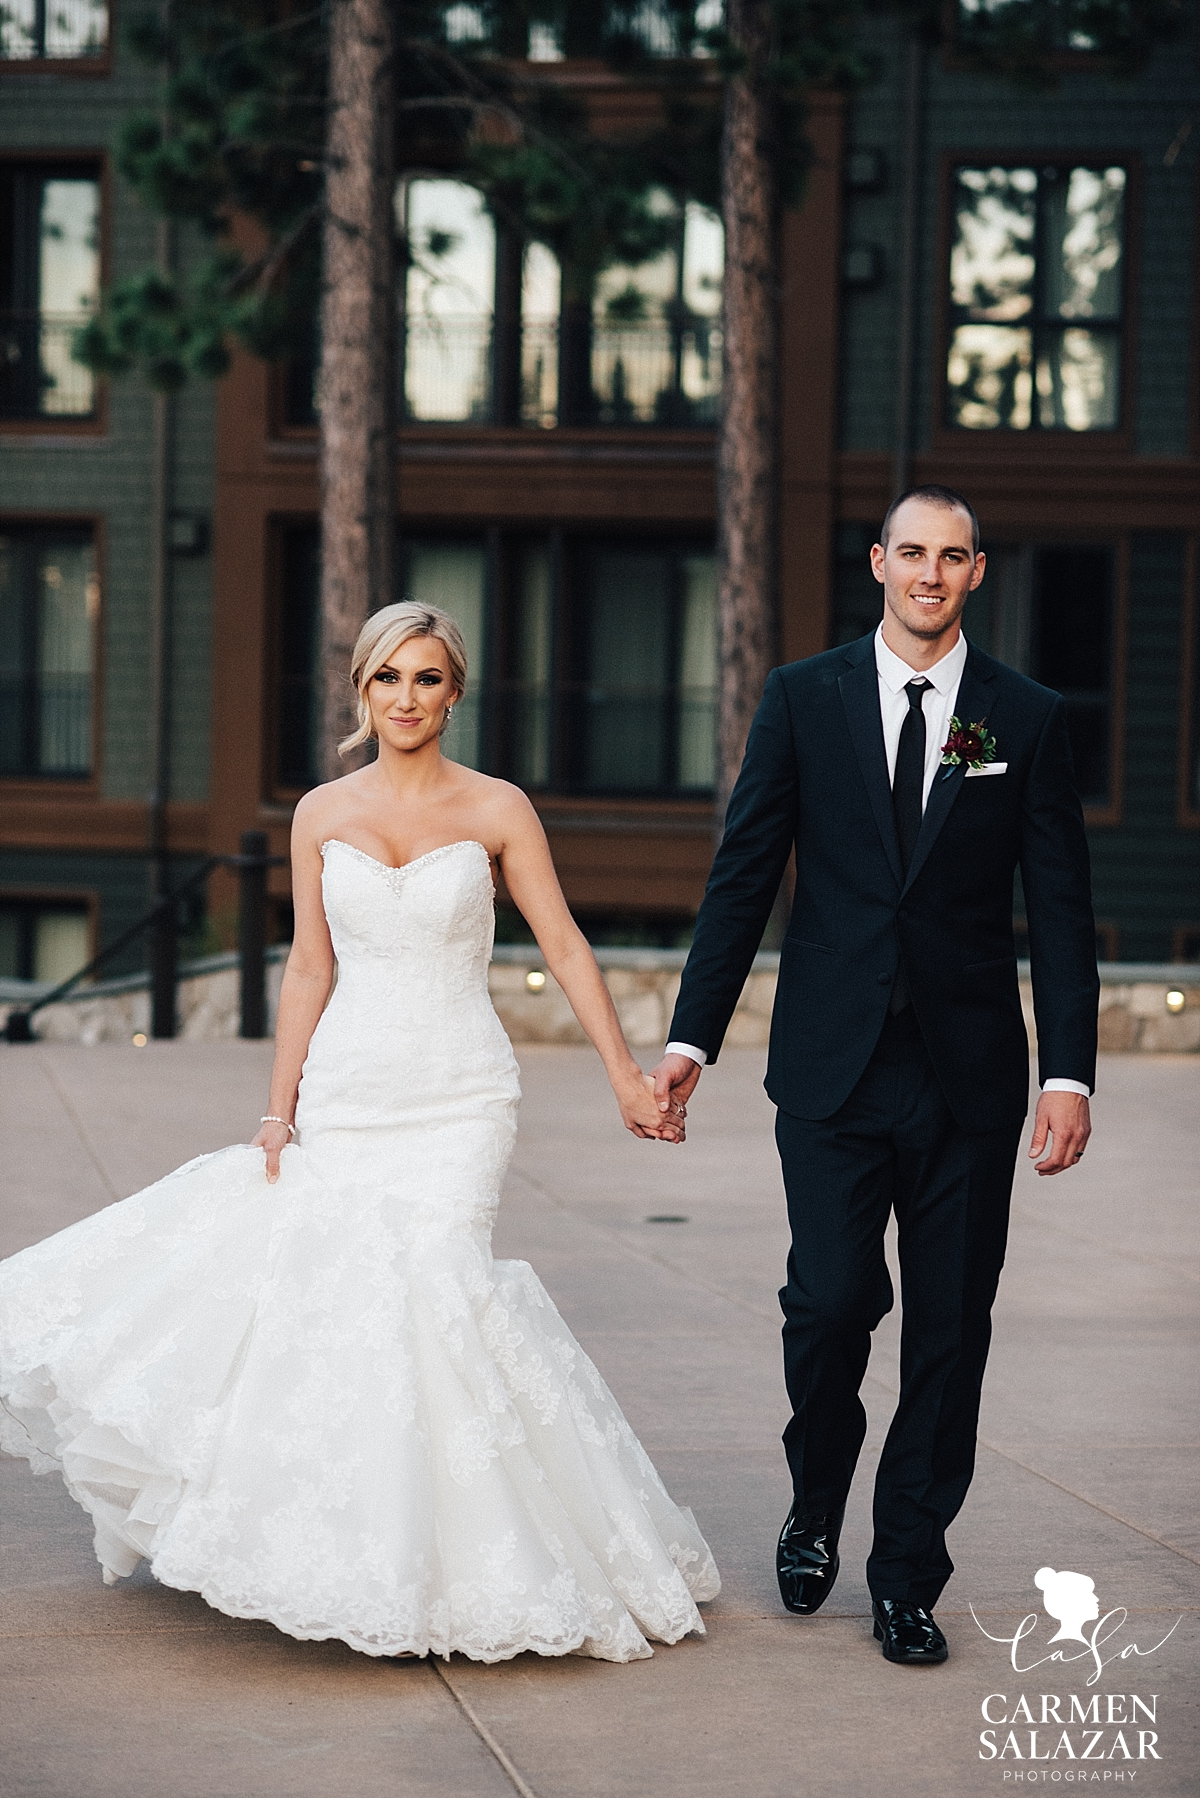 Stunning Ritz-Carlton bride and groom - Carmen Salazar